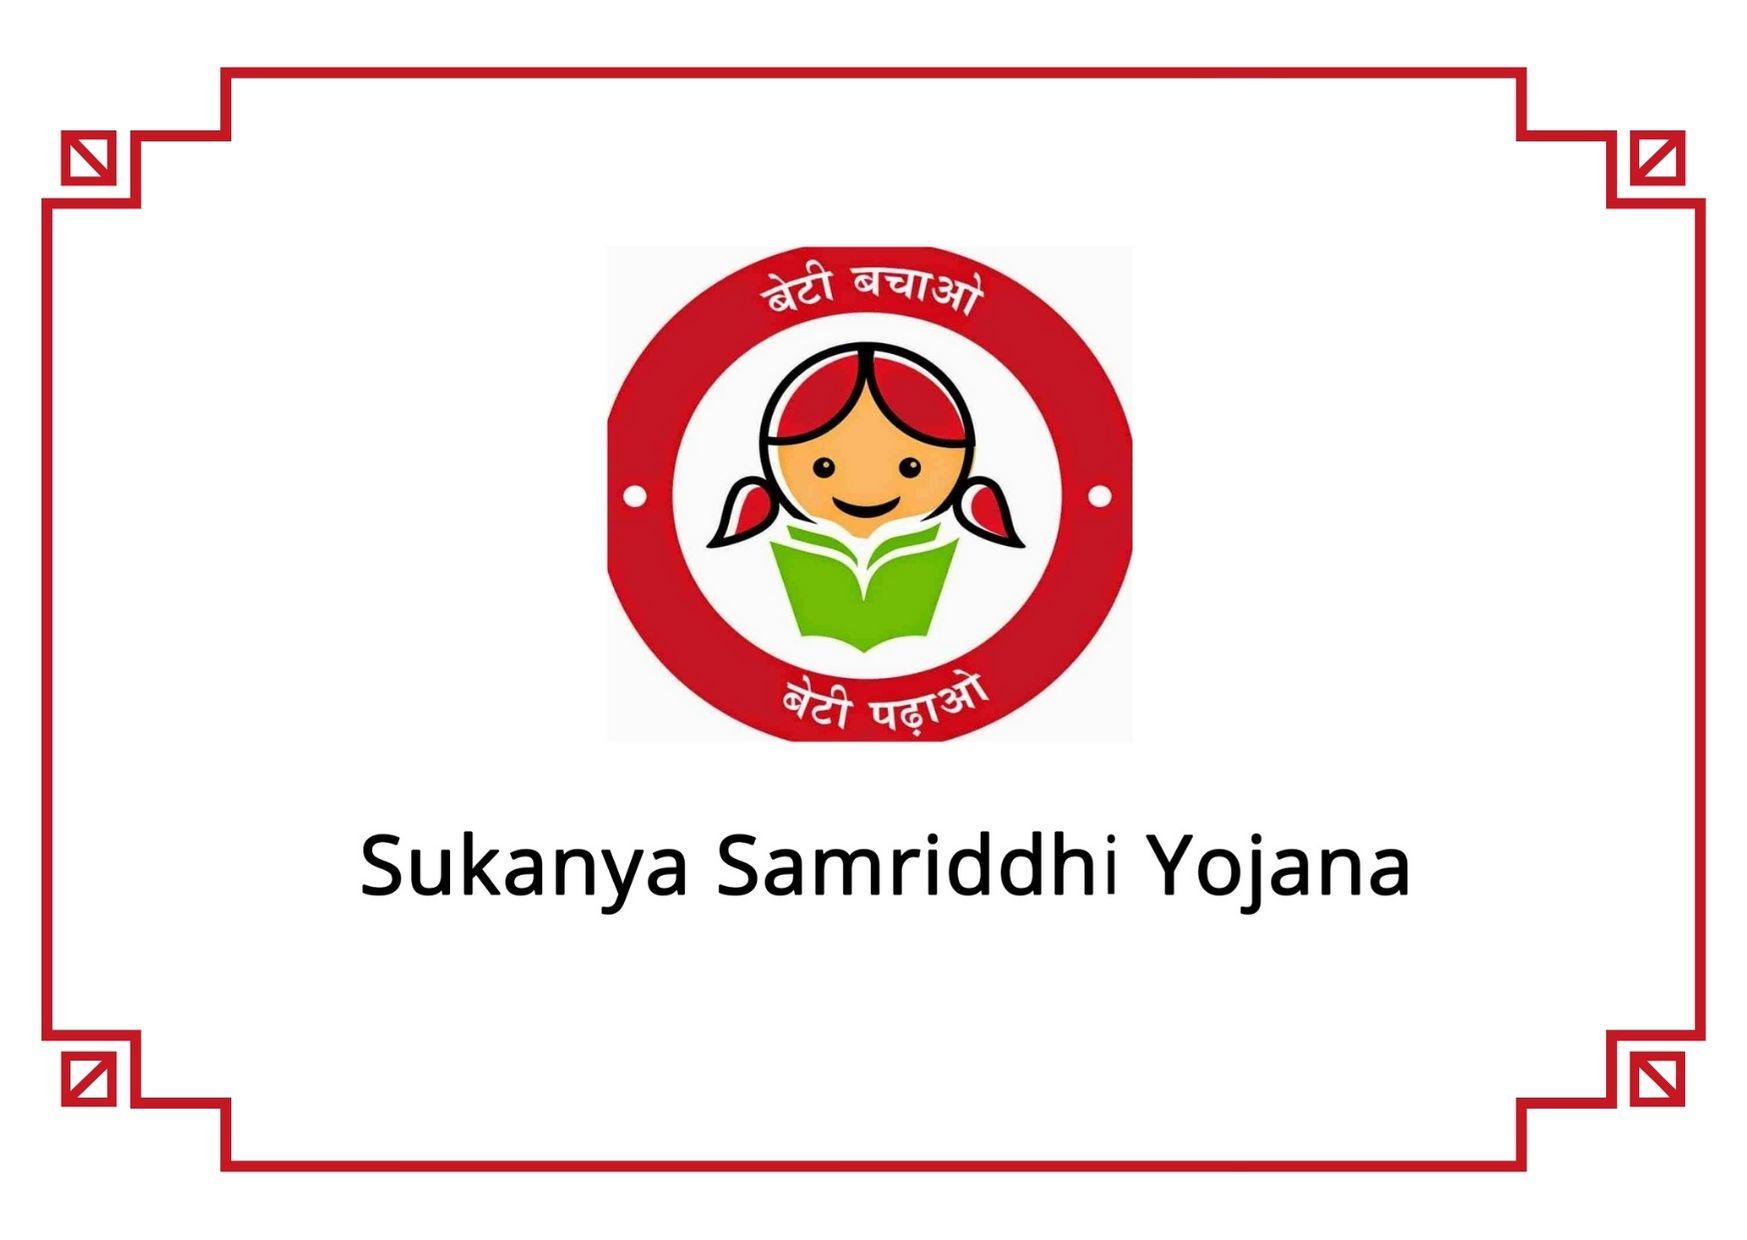 Sukanya Samriddhi Yojana Scheme